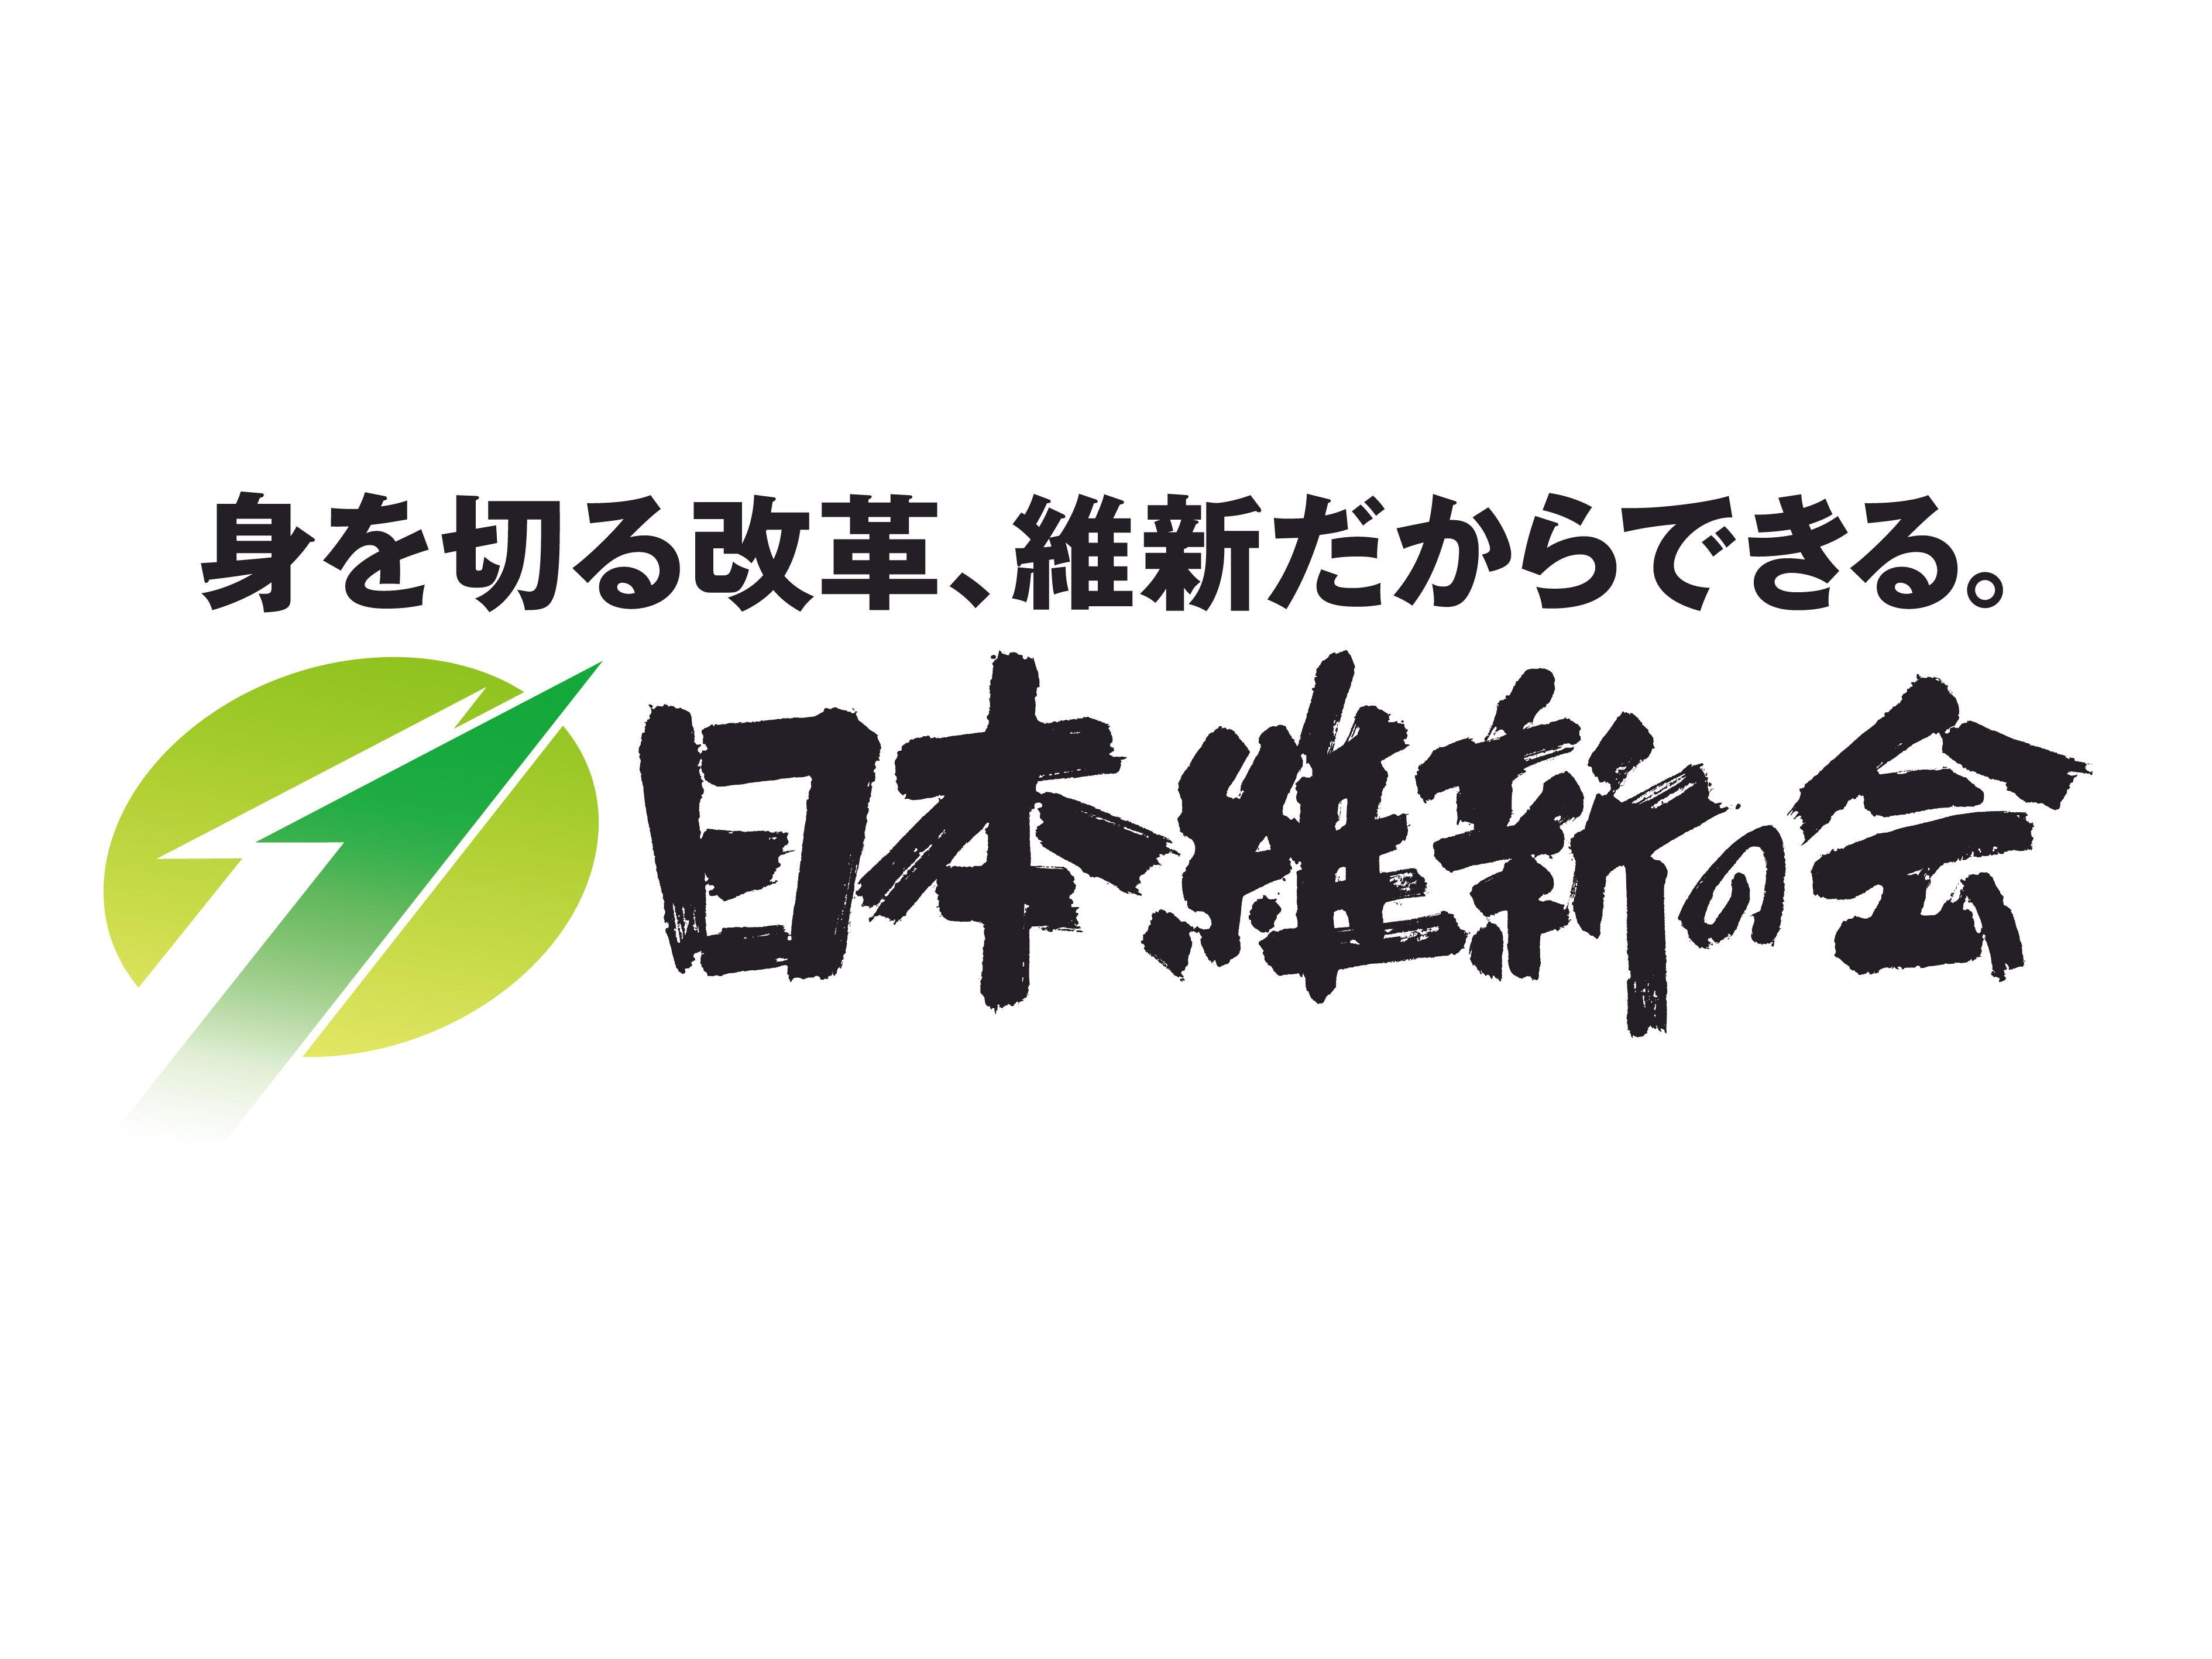 2021年5月17日(月) 日本維新の会「日本大改革プラン」 記者会見